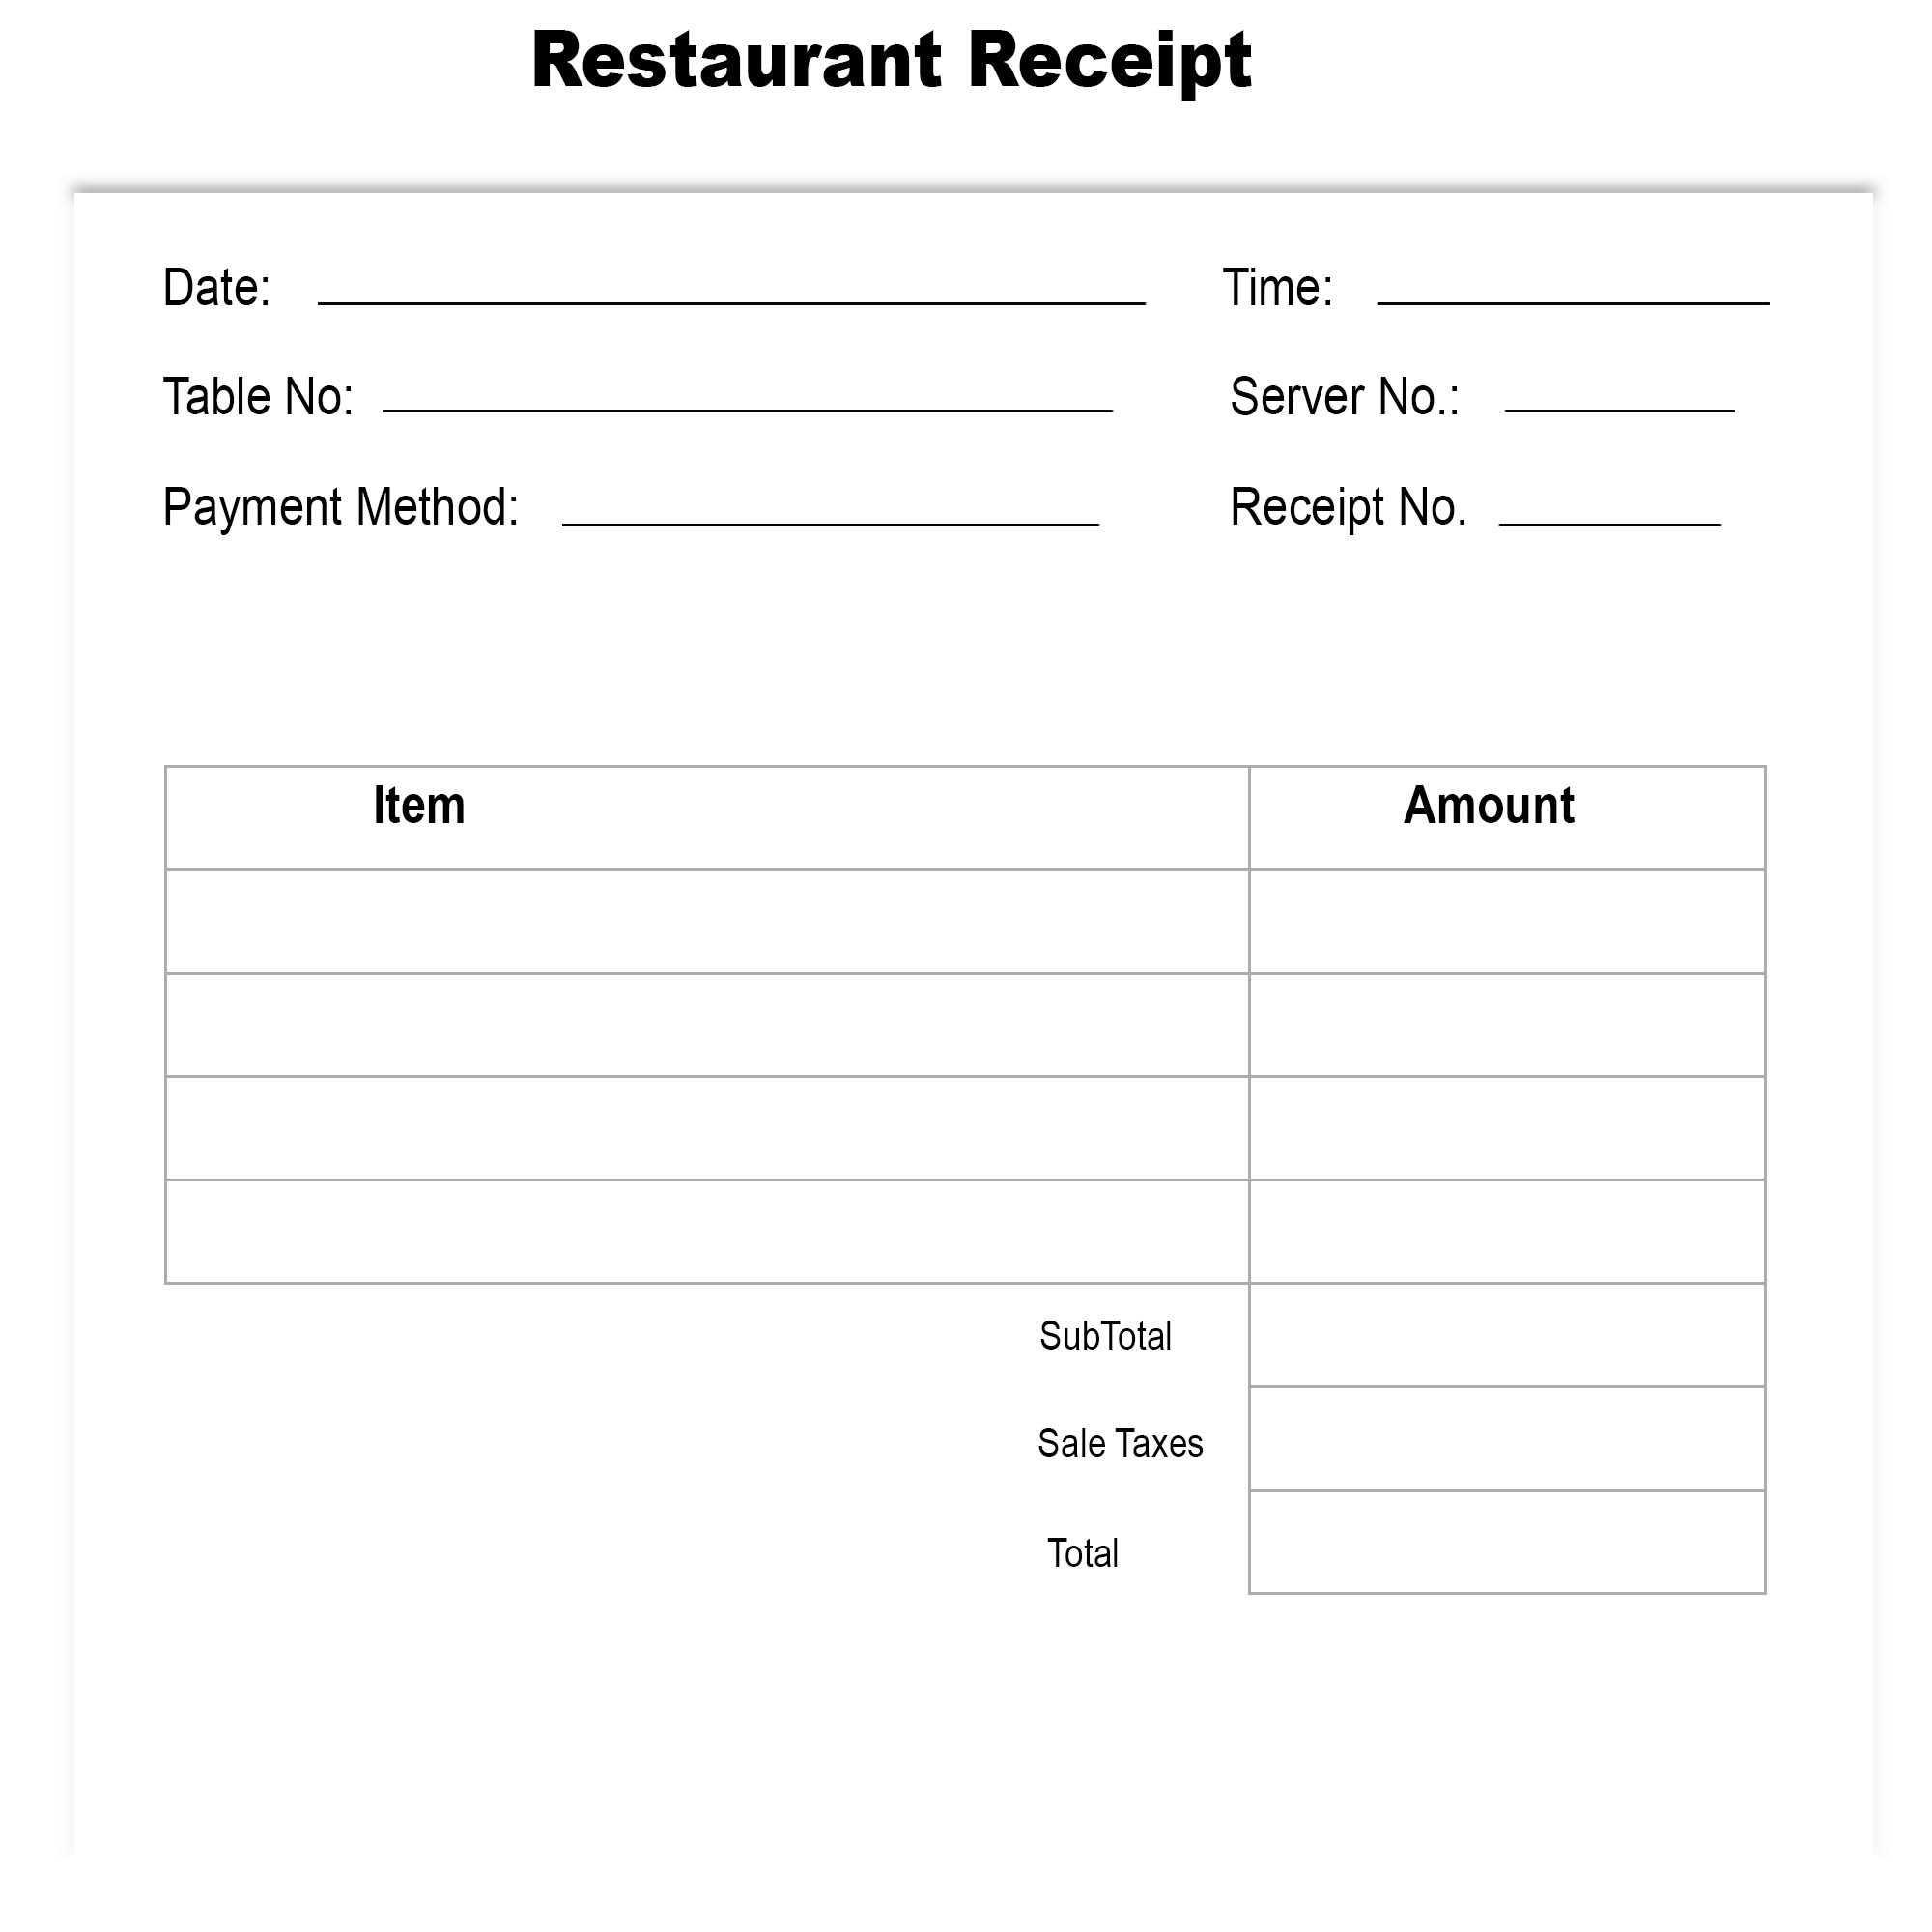 Blank Restaurant Receipt Template | The Receipt Template in Blank Taxi Receipt Template